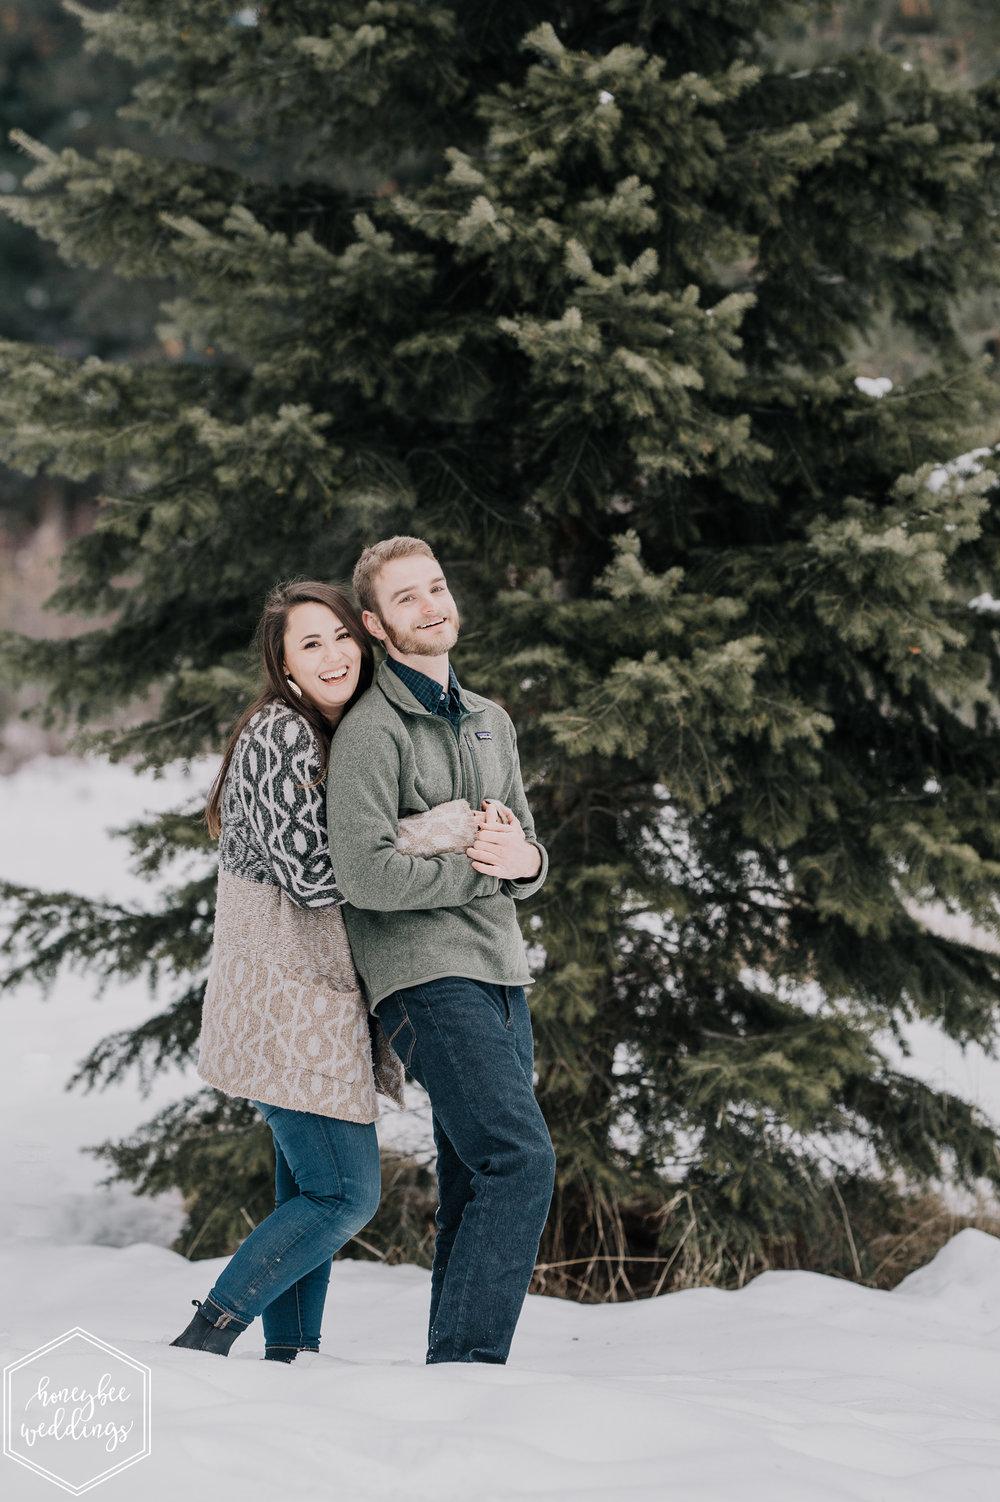 0110Missoula Engagement Session_Rattlesnake Engagement Session_Winter Engagement_Montana Wedding Photographer_Corey & Corey Engagement_December 08, 2018-434.jpg